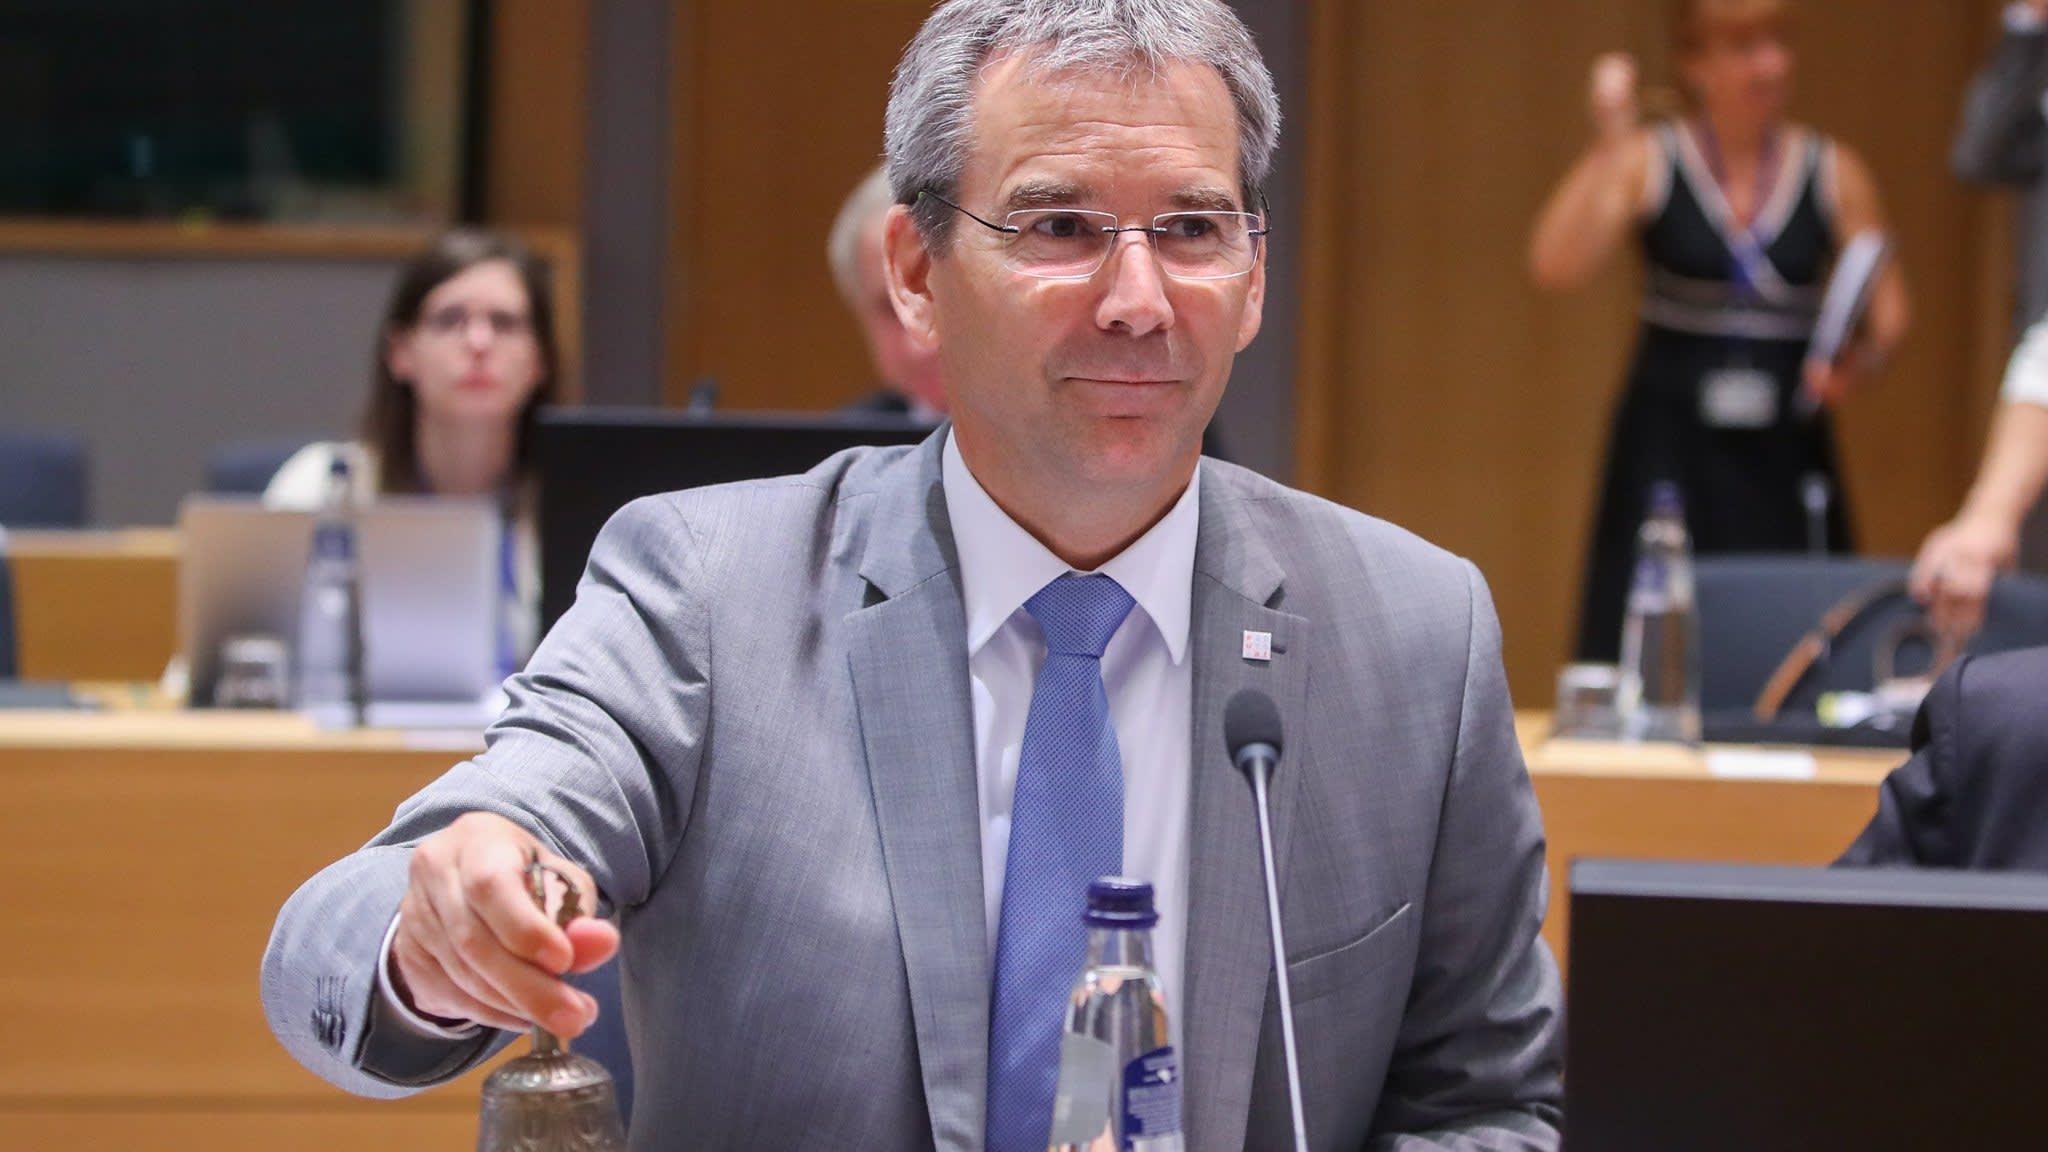 Austria ramps up push for EU-wide digital tax on Big Tech